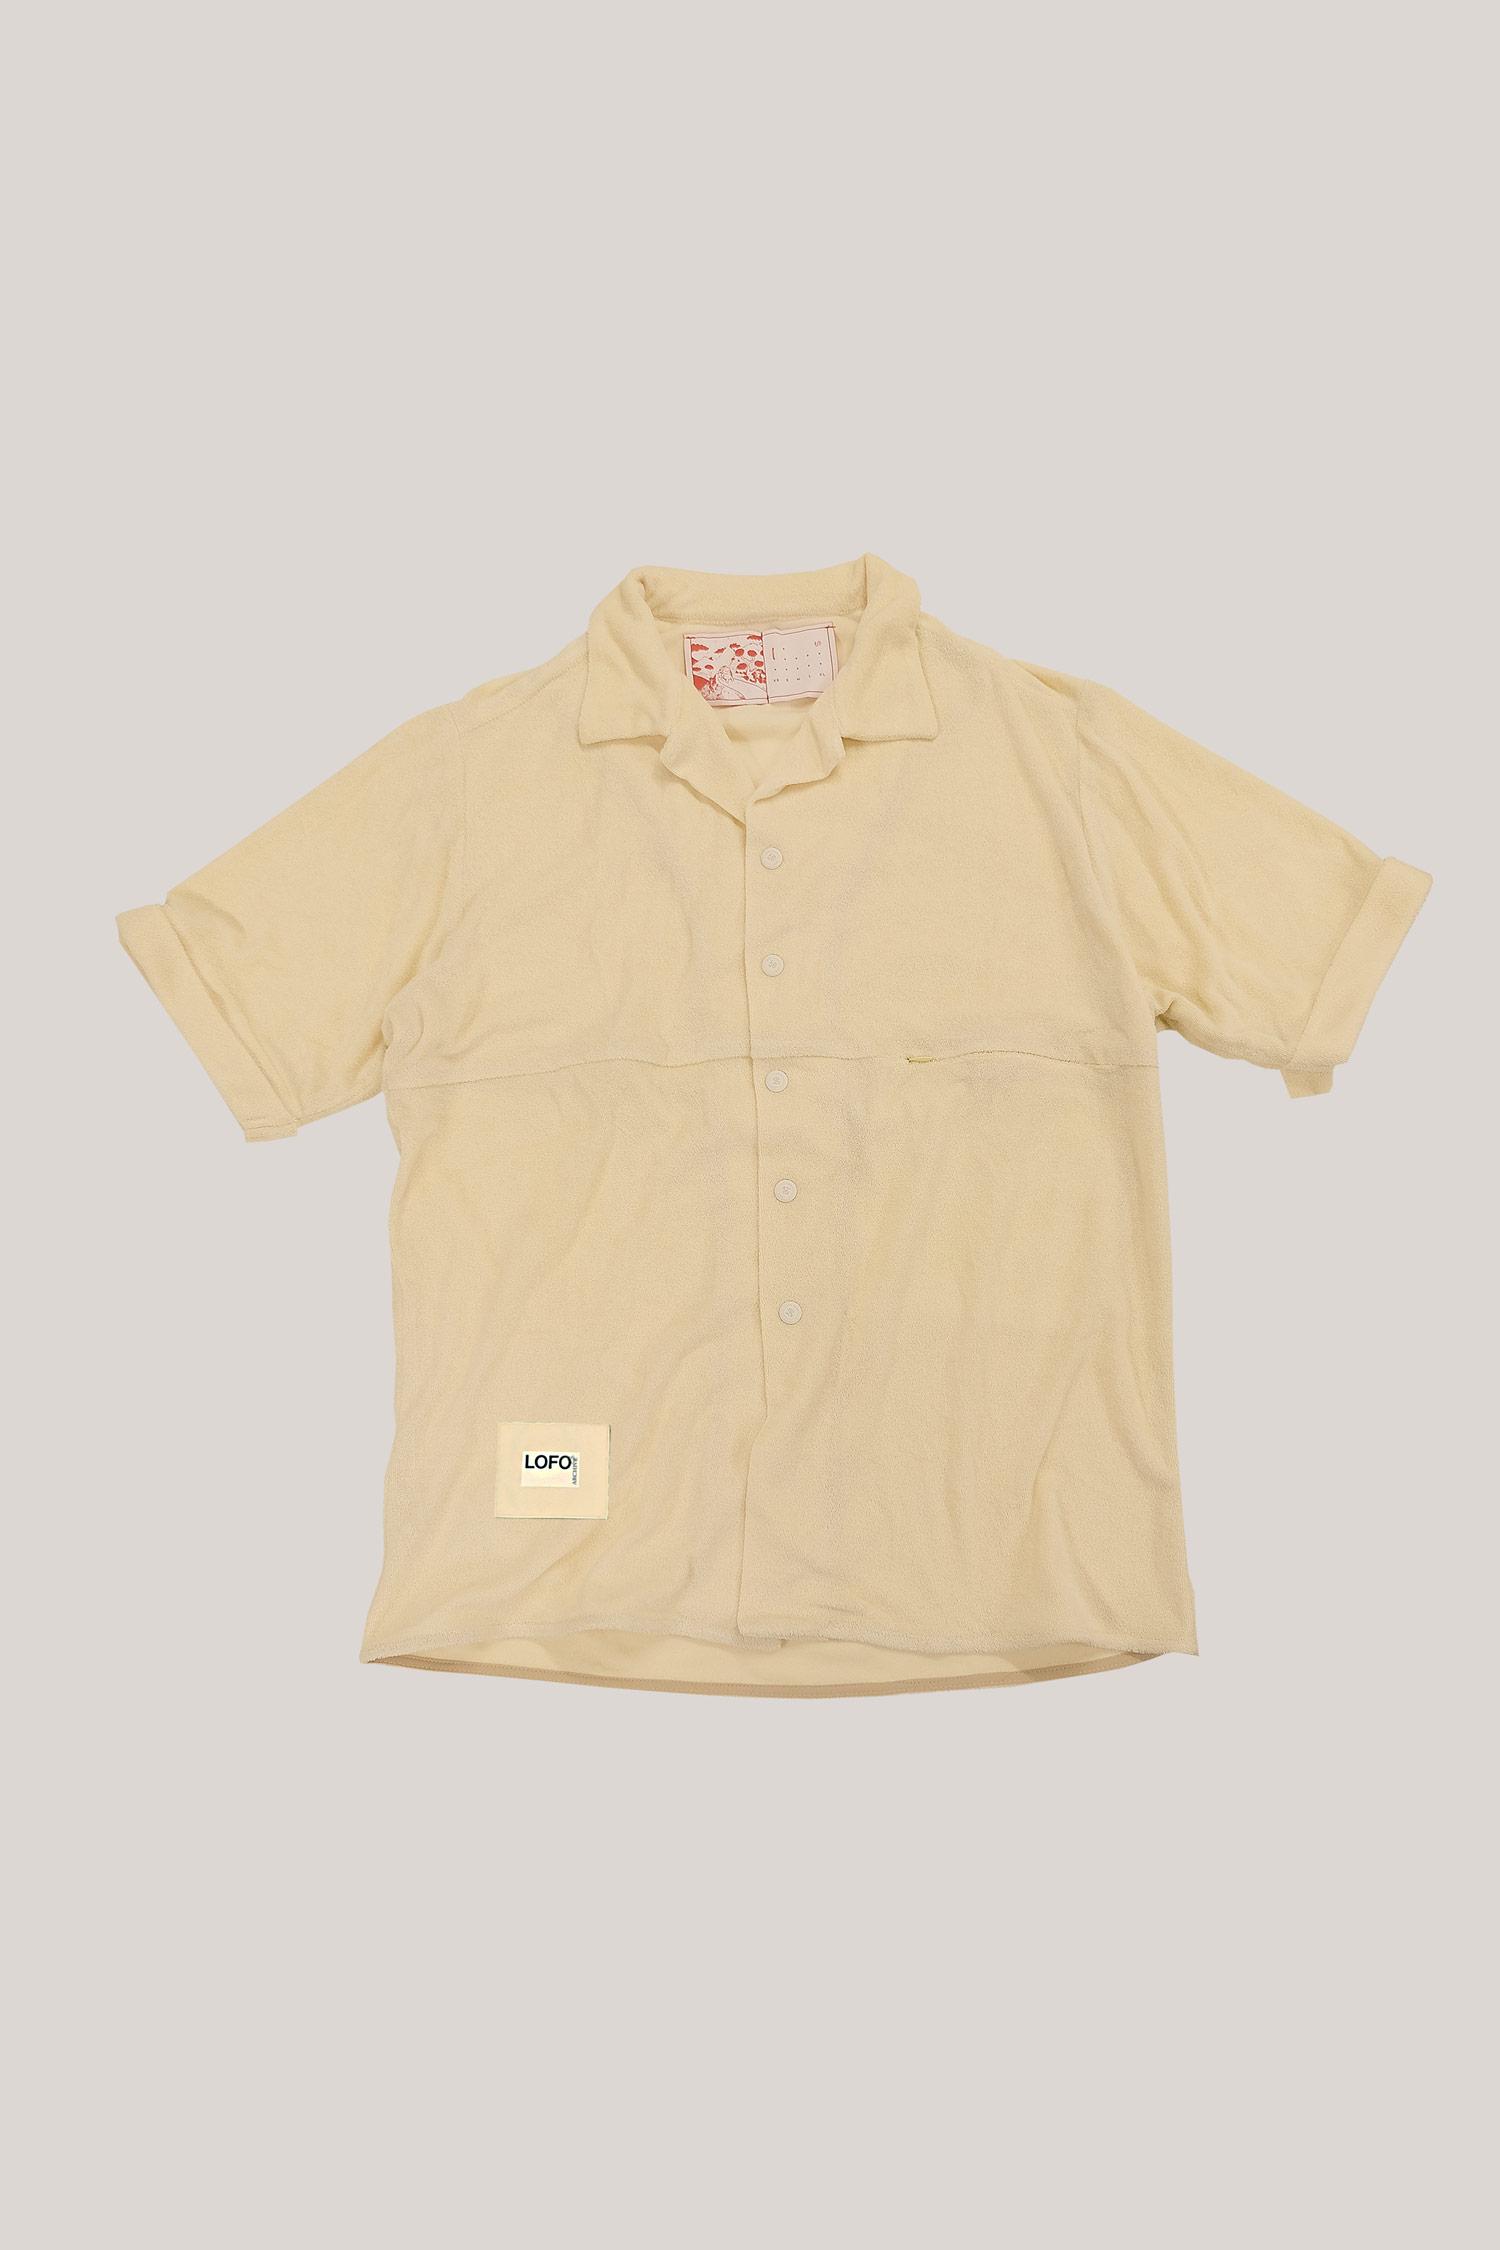 31-Terry-Shirt-1